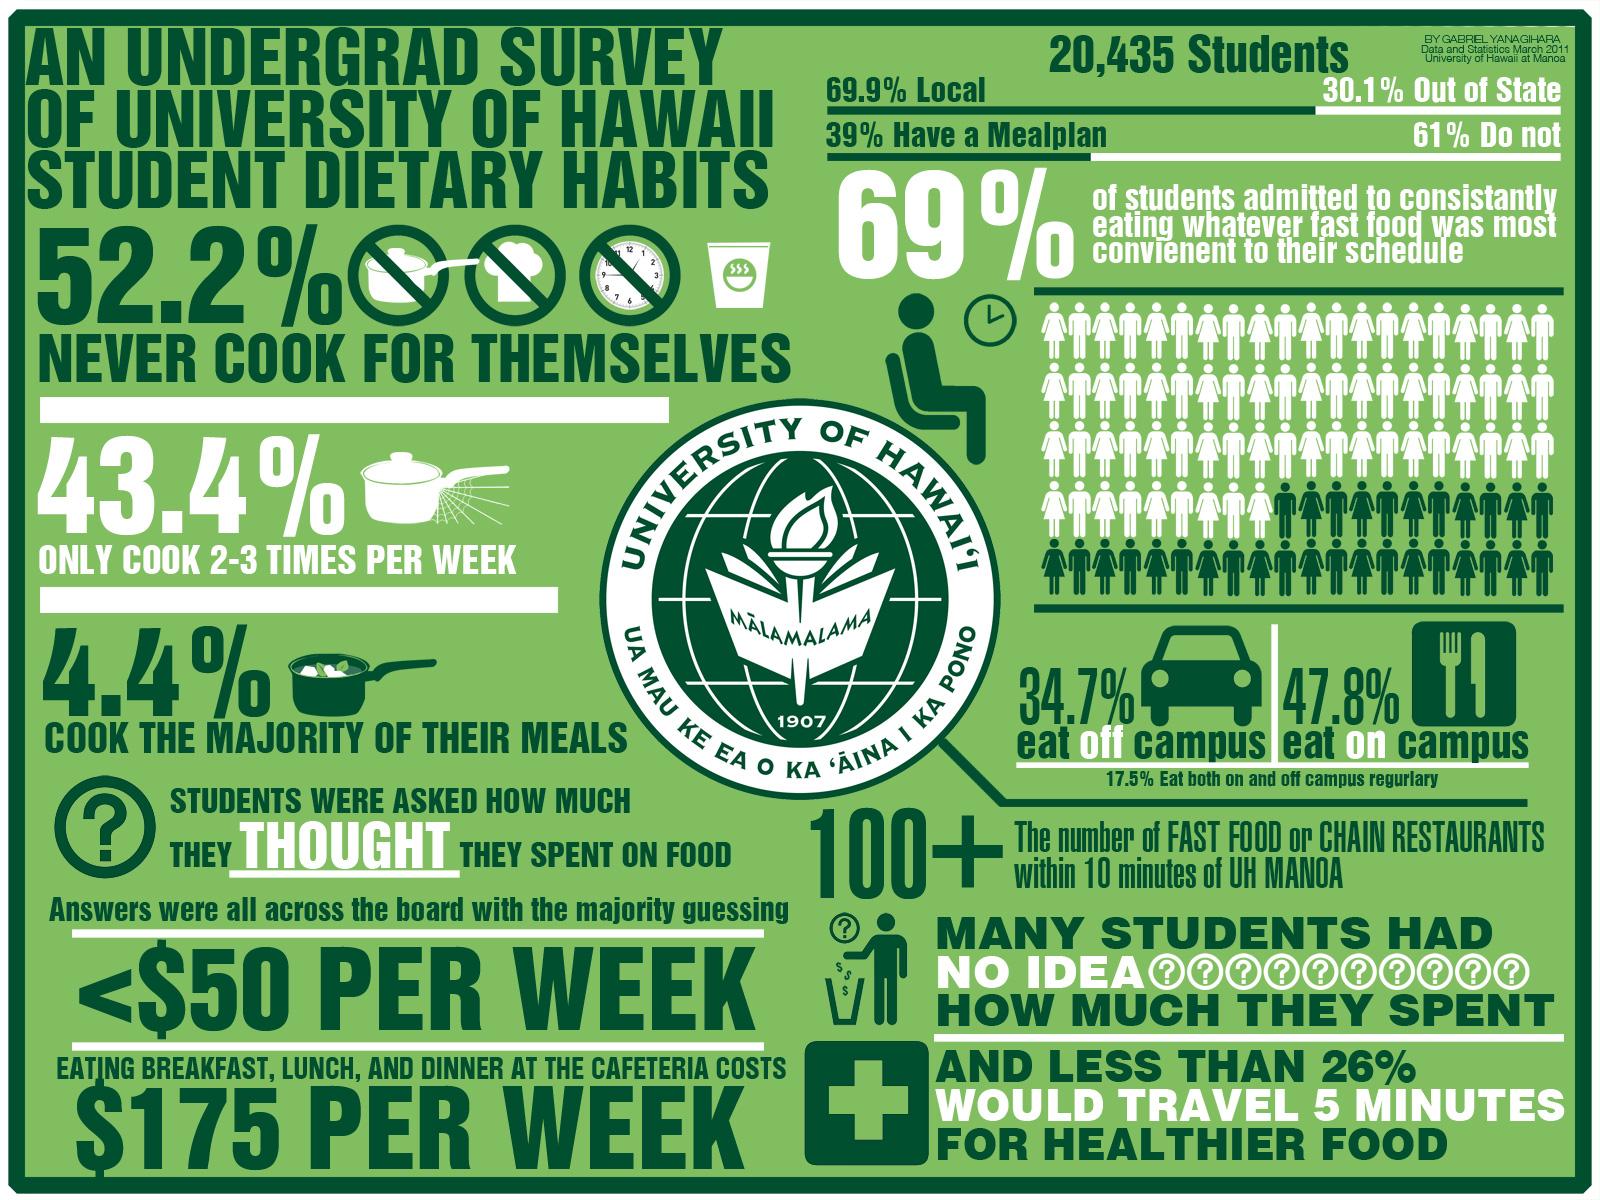 Infographic by gabrielyanagihara